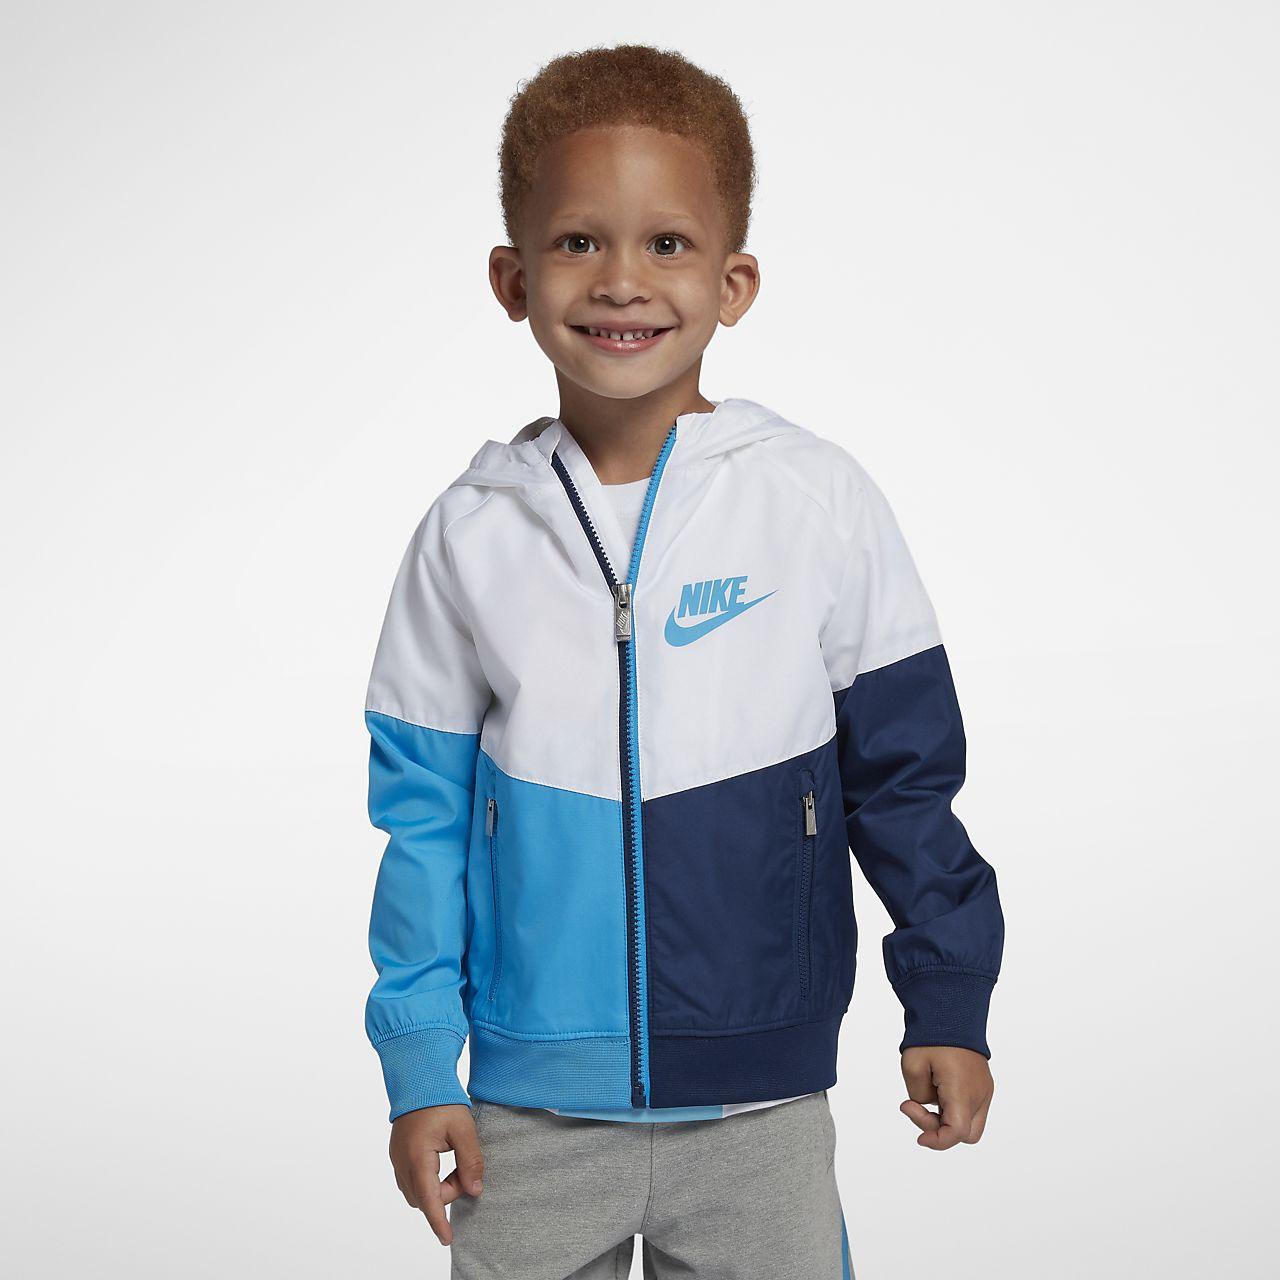 Nike Sportswear Windrunner 幼童全长拉链开襟夹克